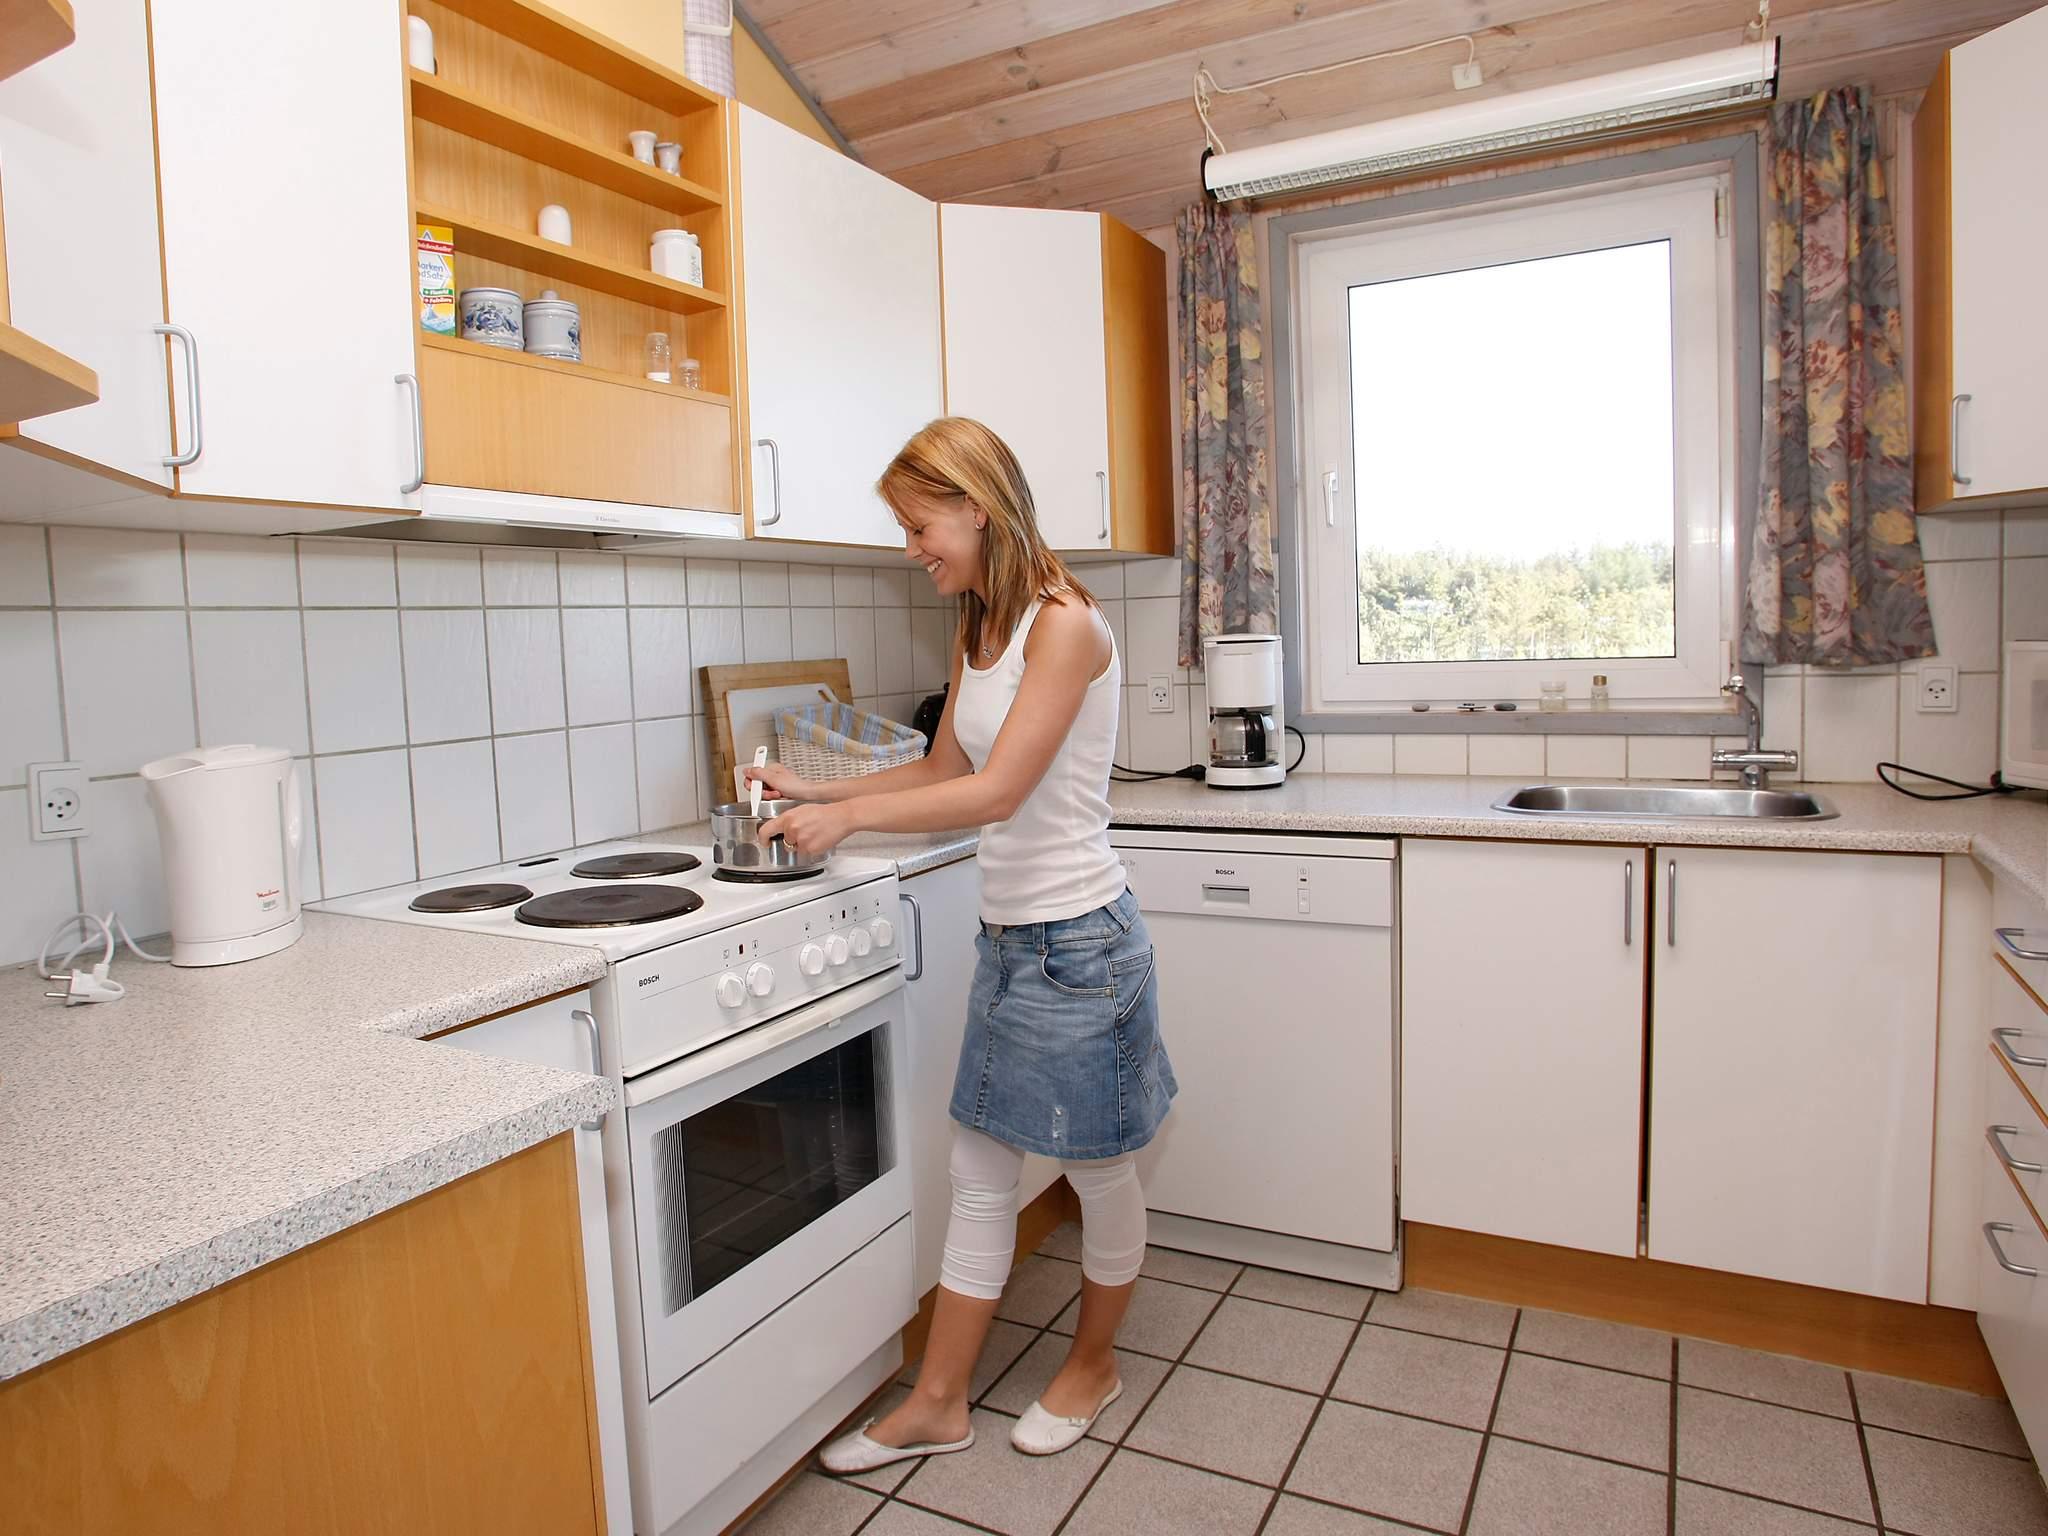 Ferienhaus Nr. Lyngby (335283), Løkken, , Nordwestjütland, Dänemark, Bild 4